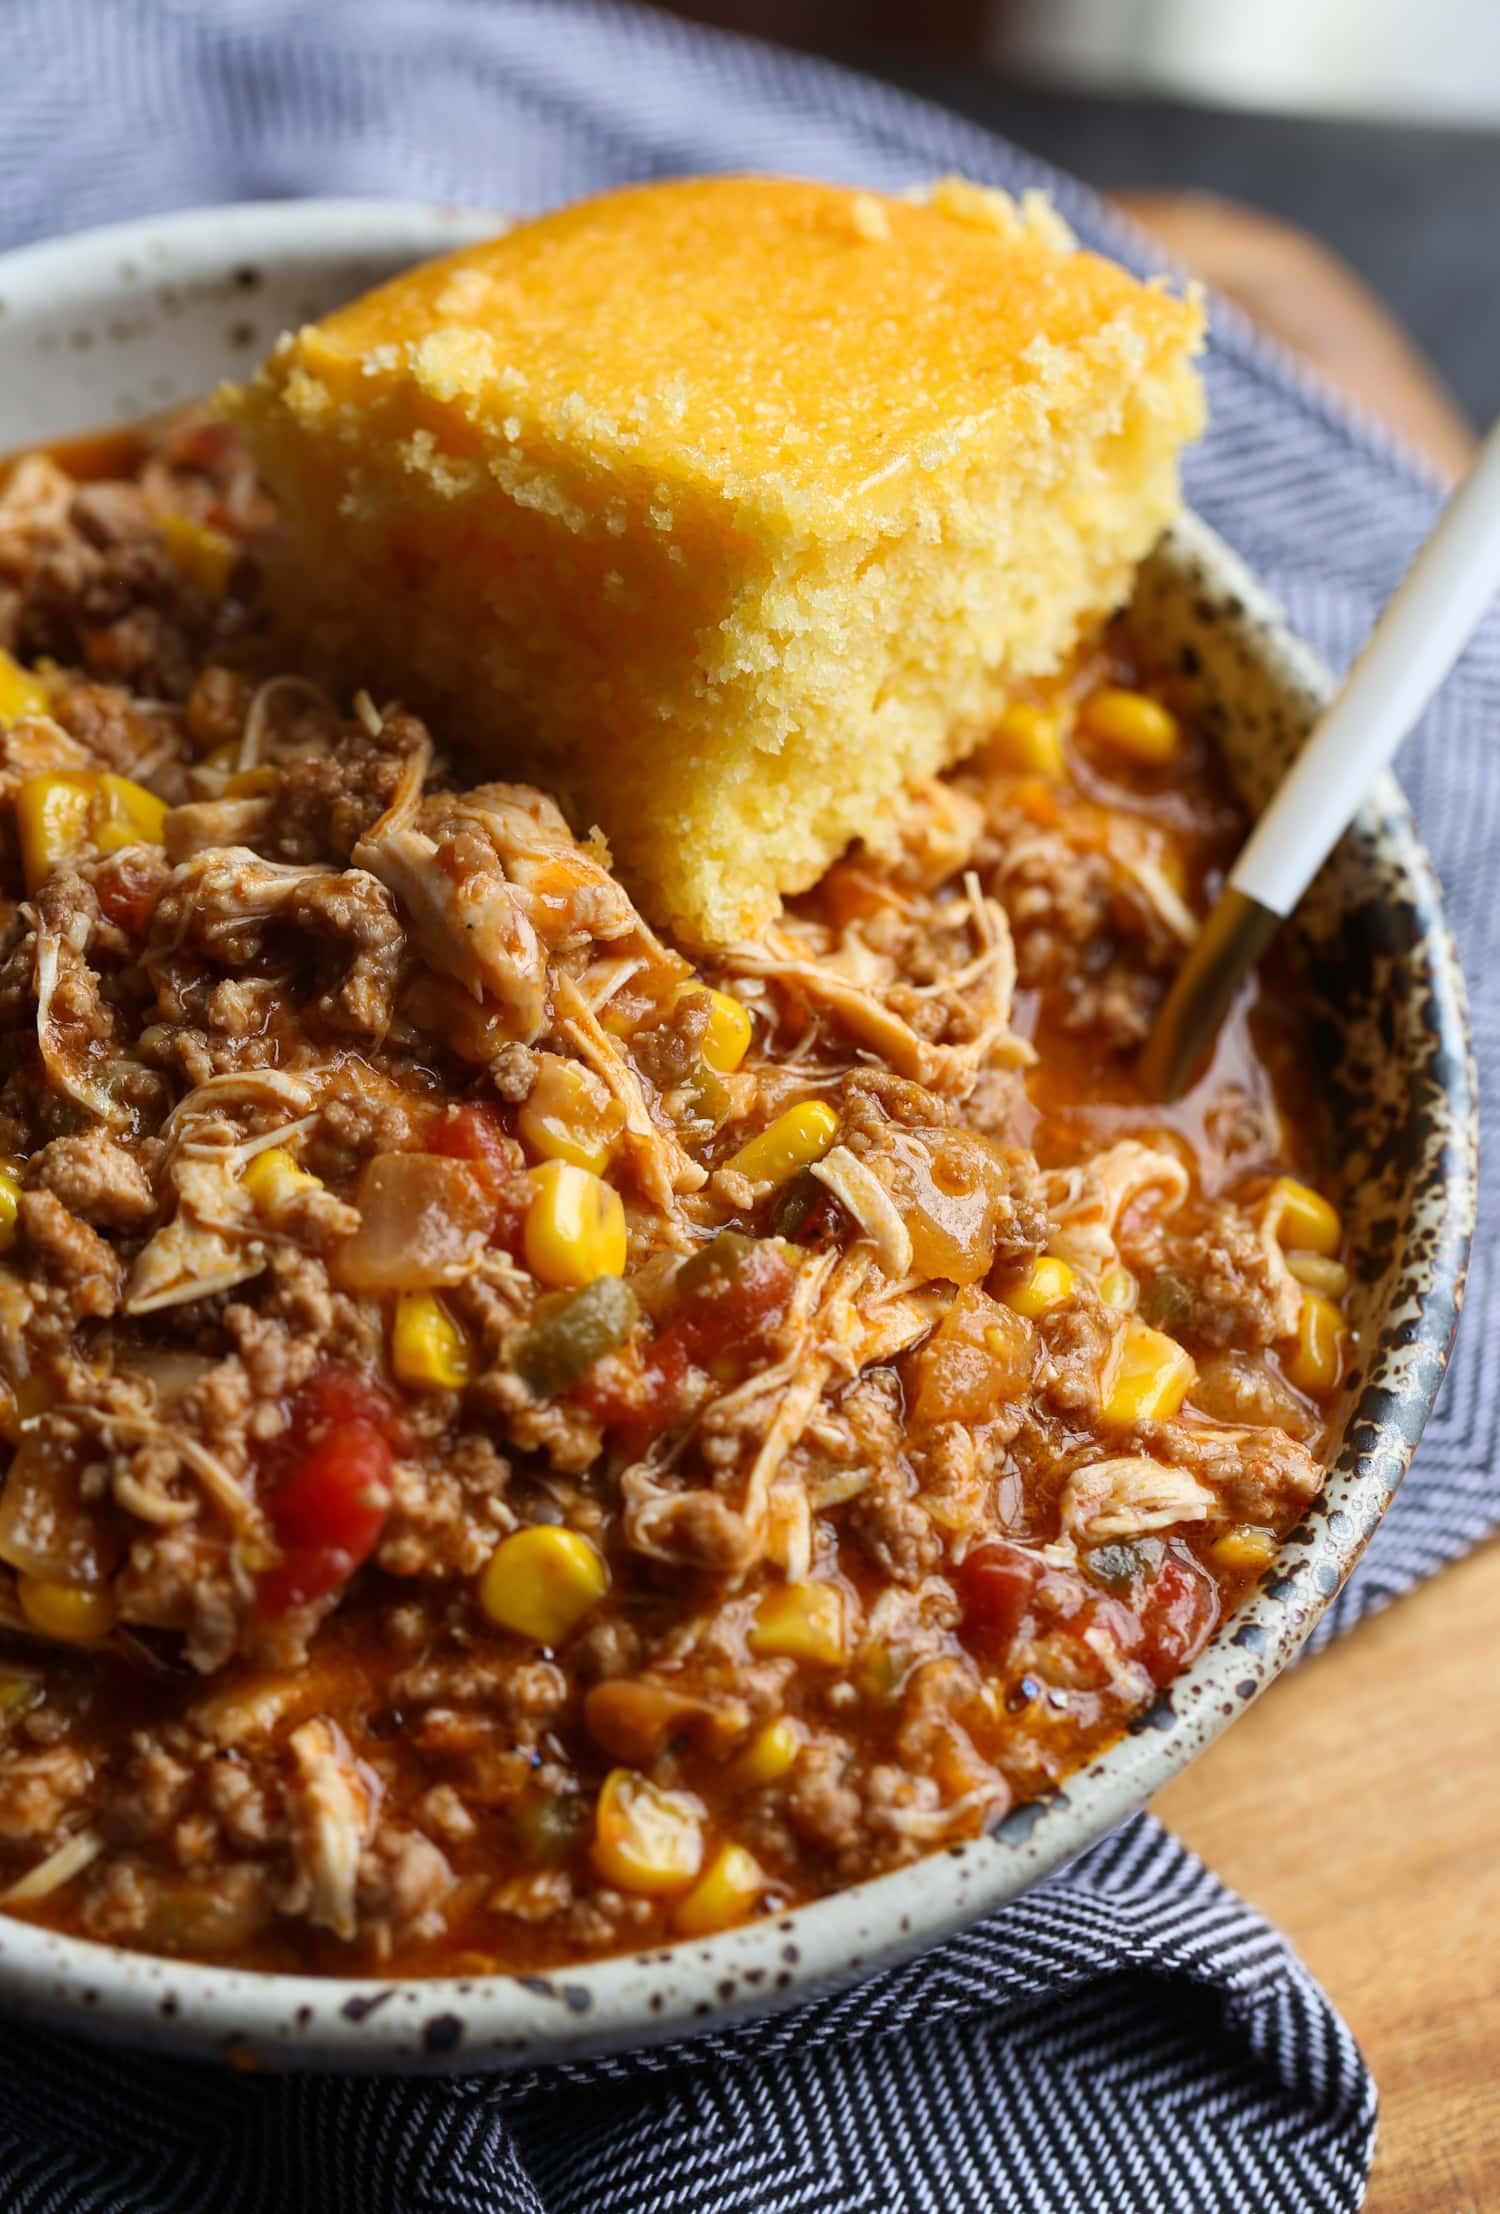 Chicken, pork, and beef stew with cornbread.